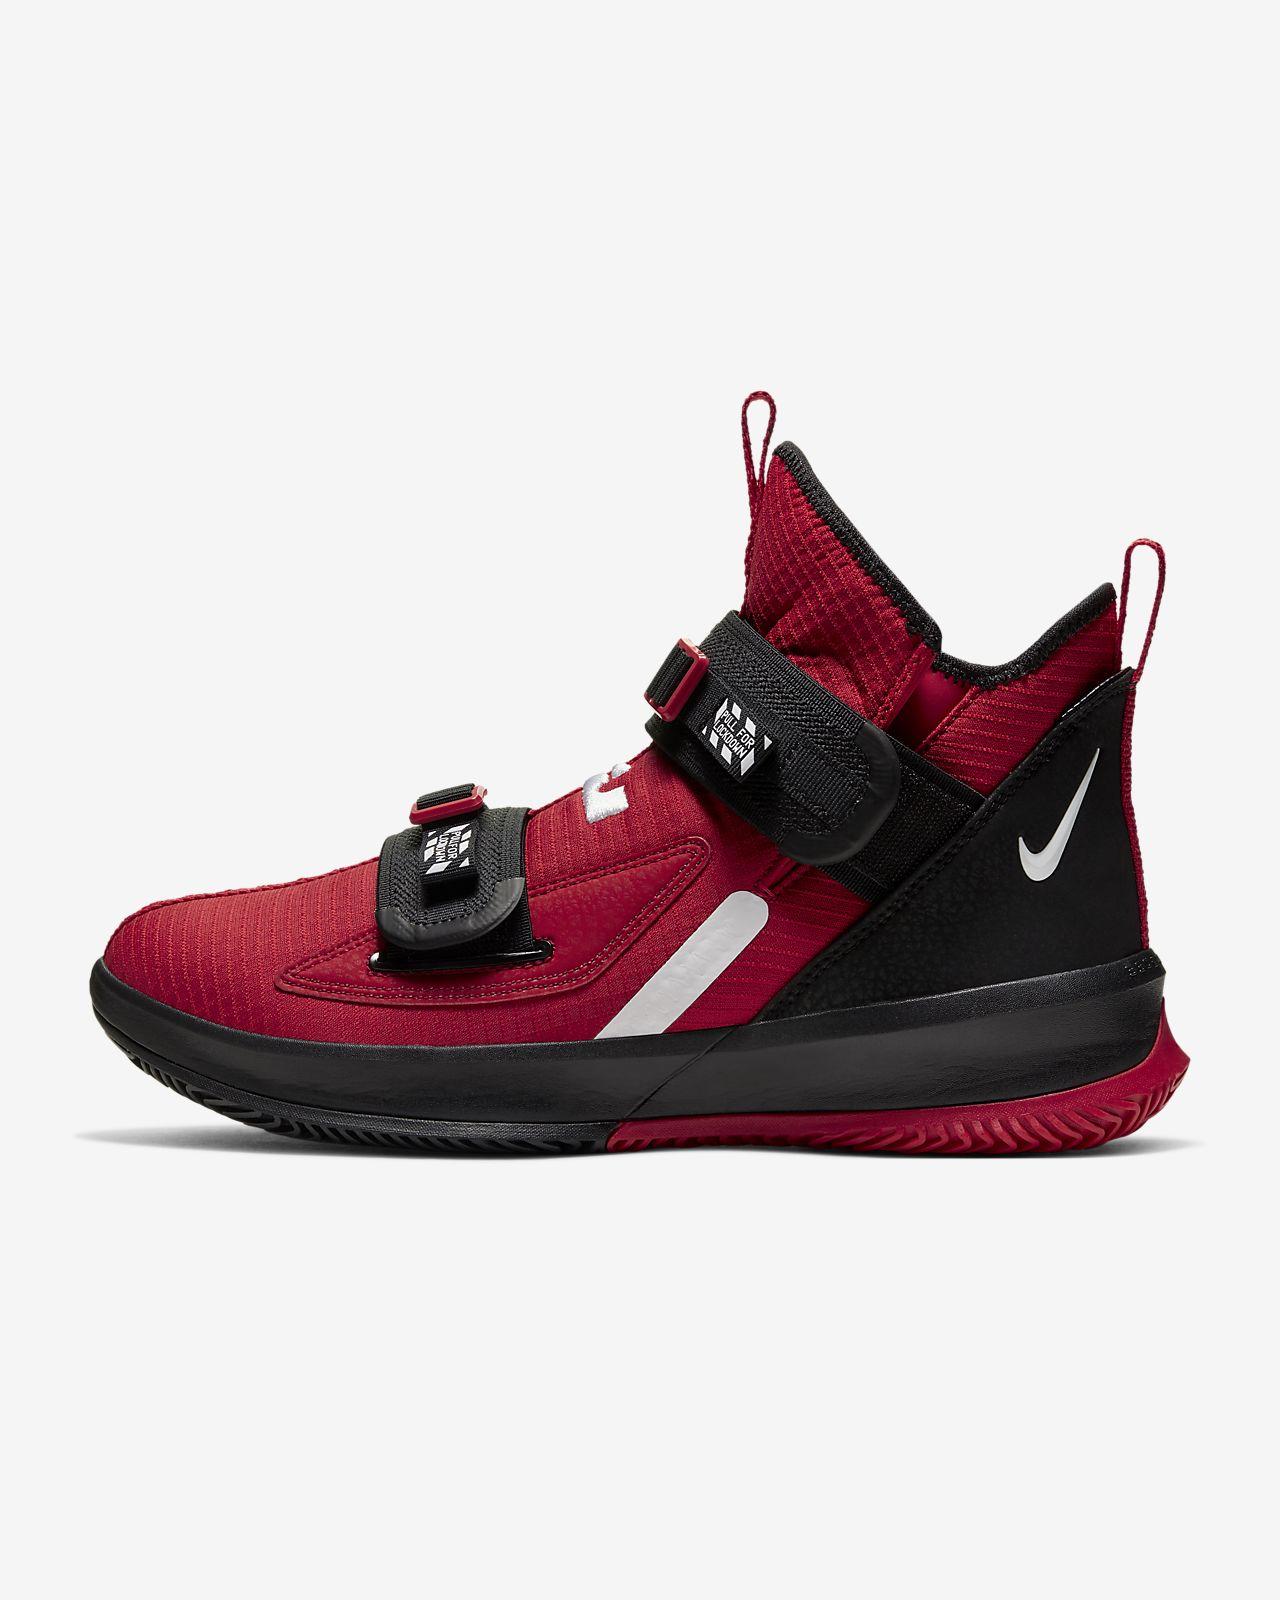 LeBron Soldier 13 SFG Basketbalschoen